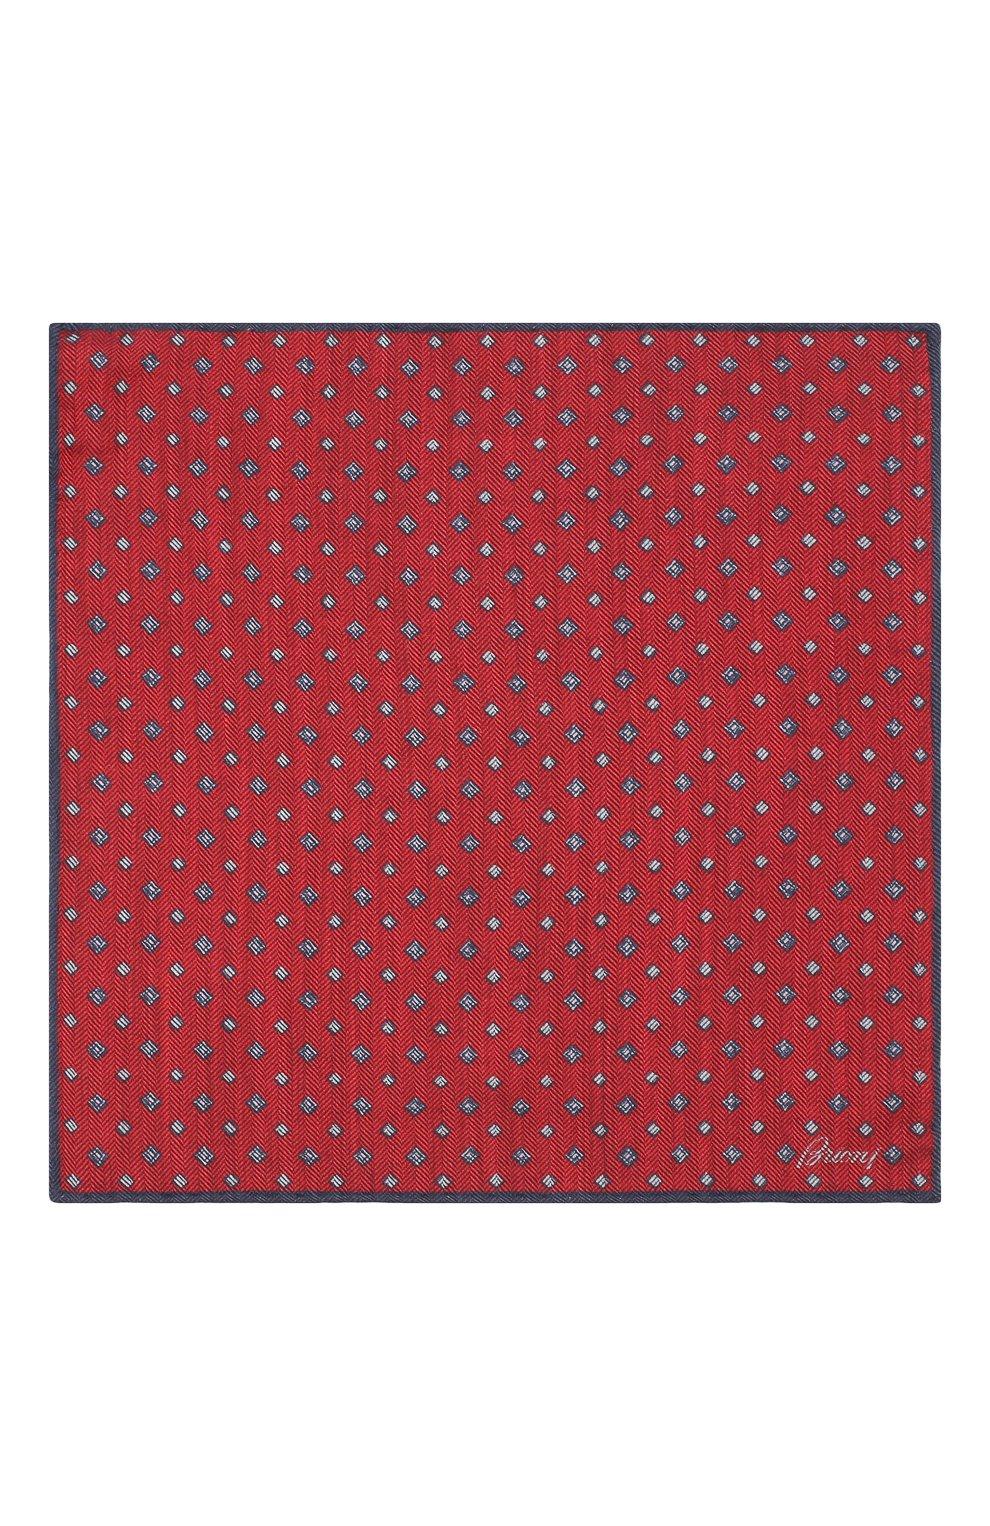 Мужской платок из смеси шерсти и шелка BRIONI красного цвета, арт. 071000/08A9F   Фото 3